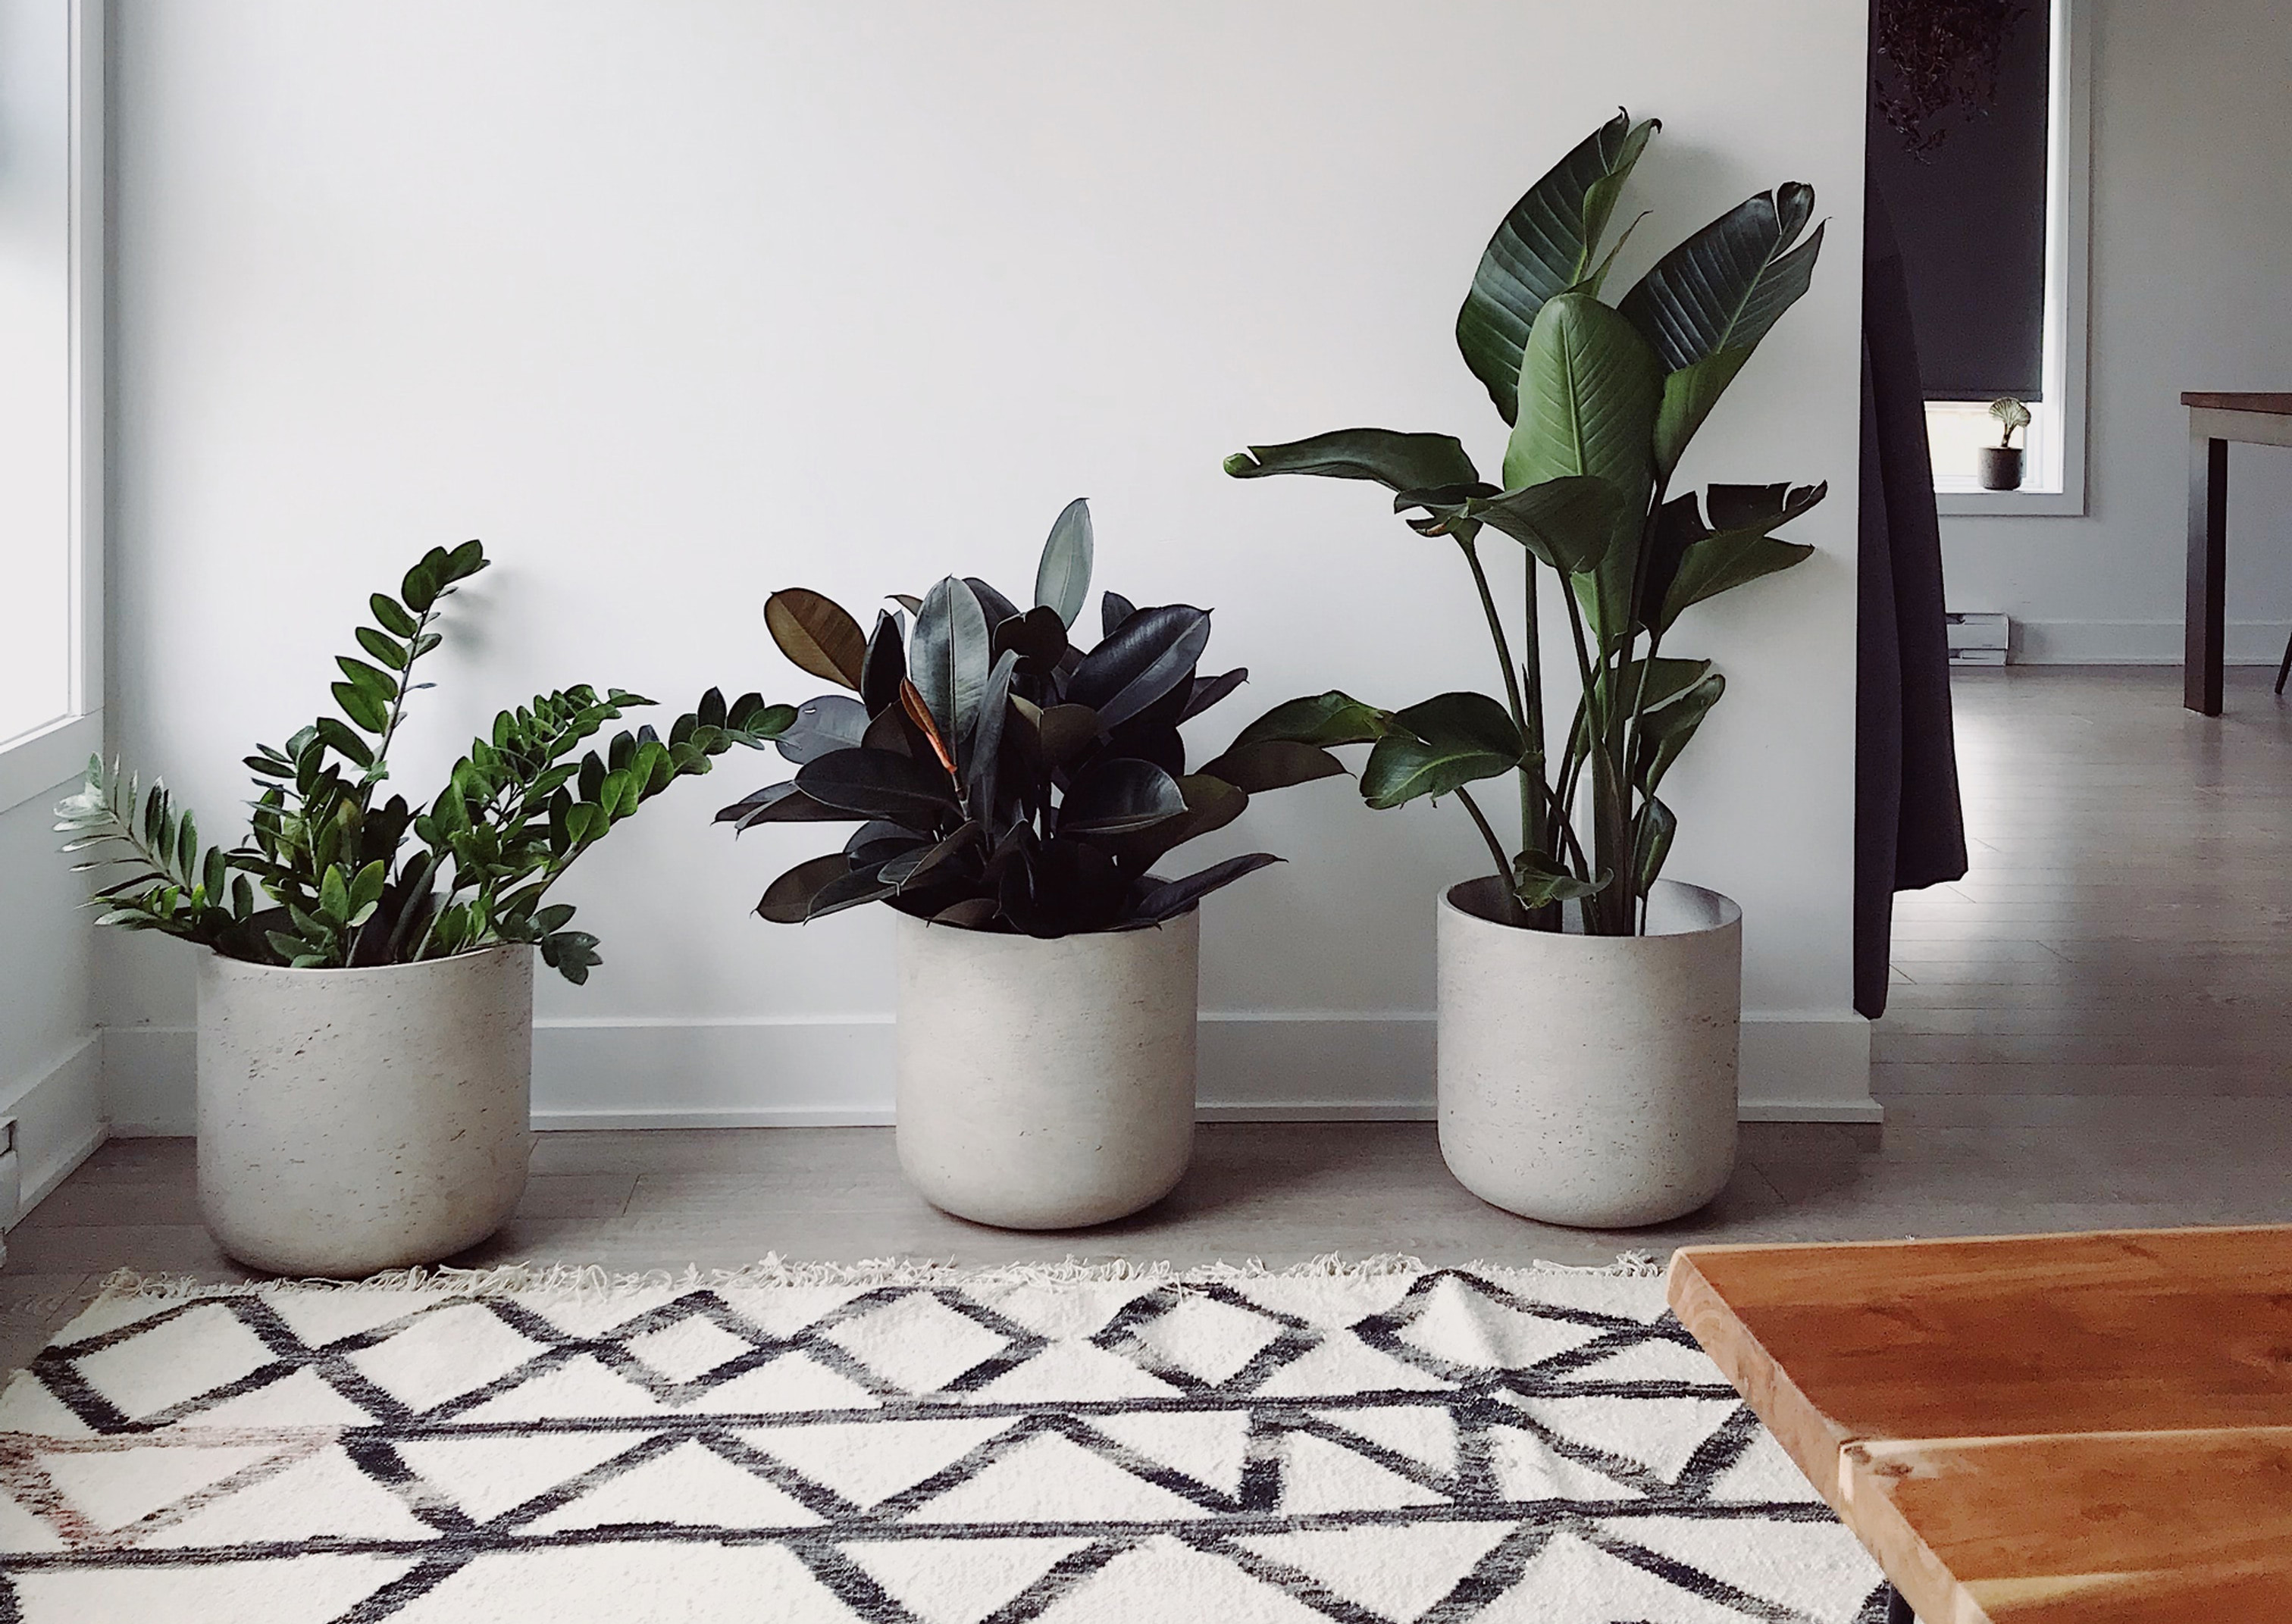 Interior Plant Design and Decor Consult